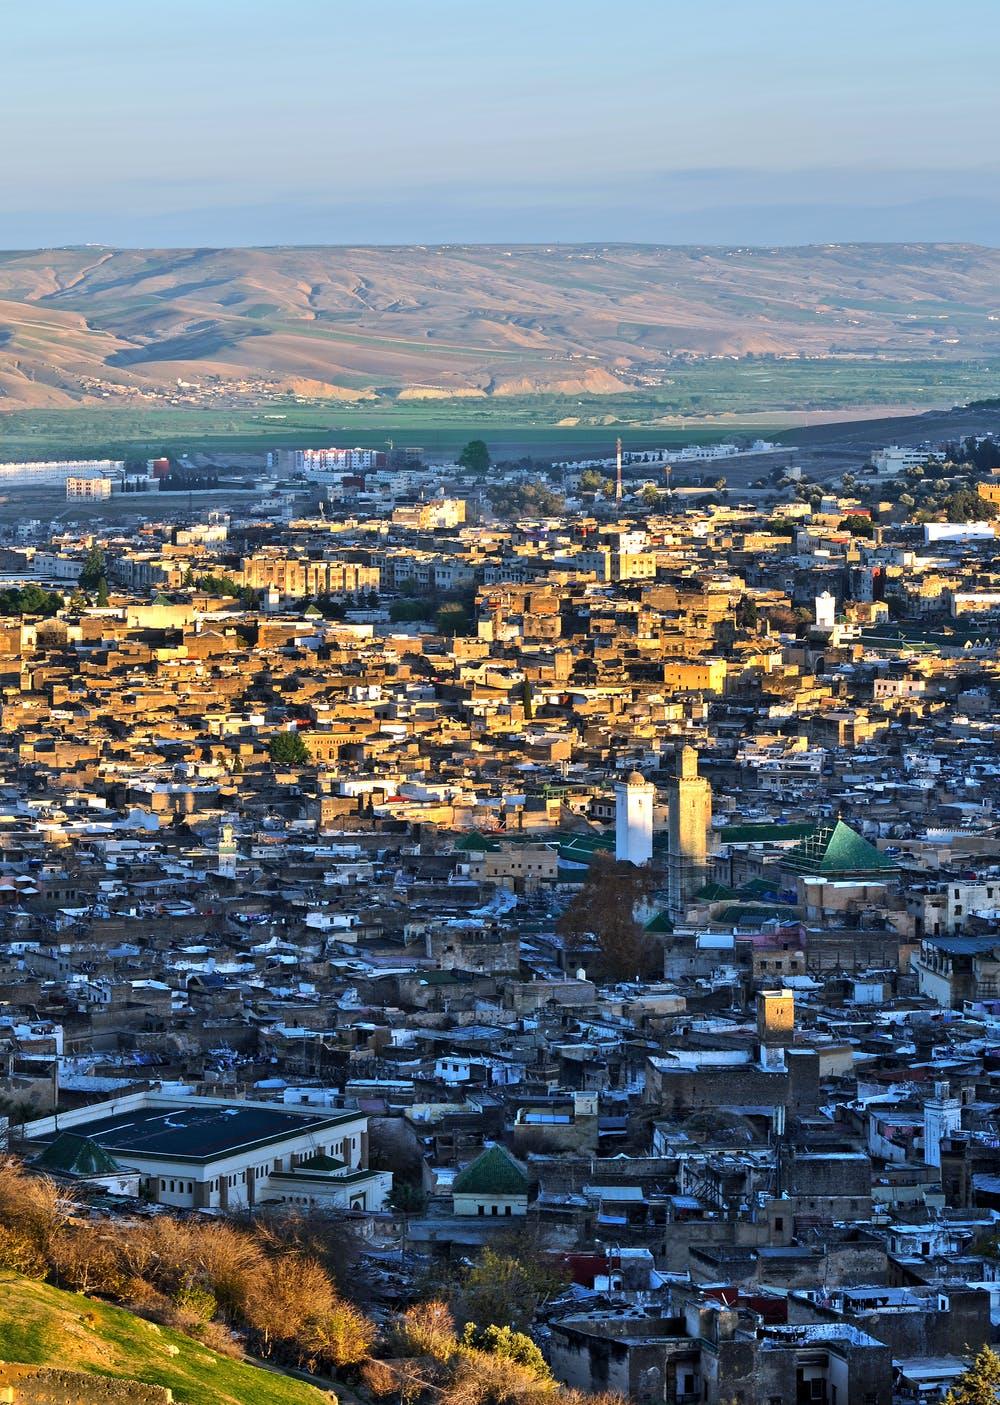 visita-guiada-de-fez-viajes-amazigh-marruecos-14